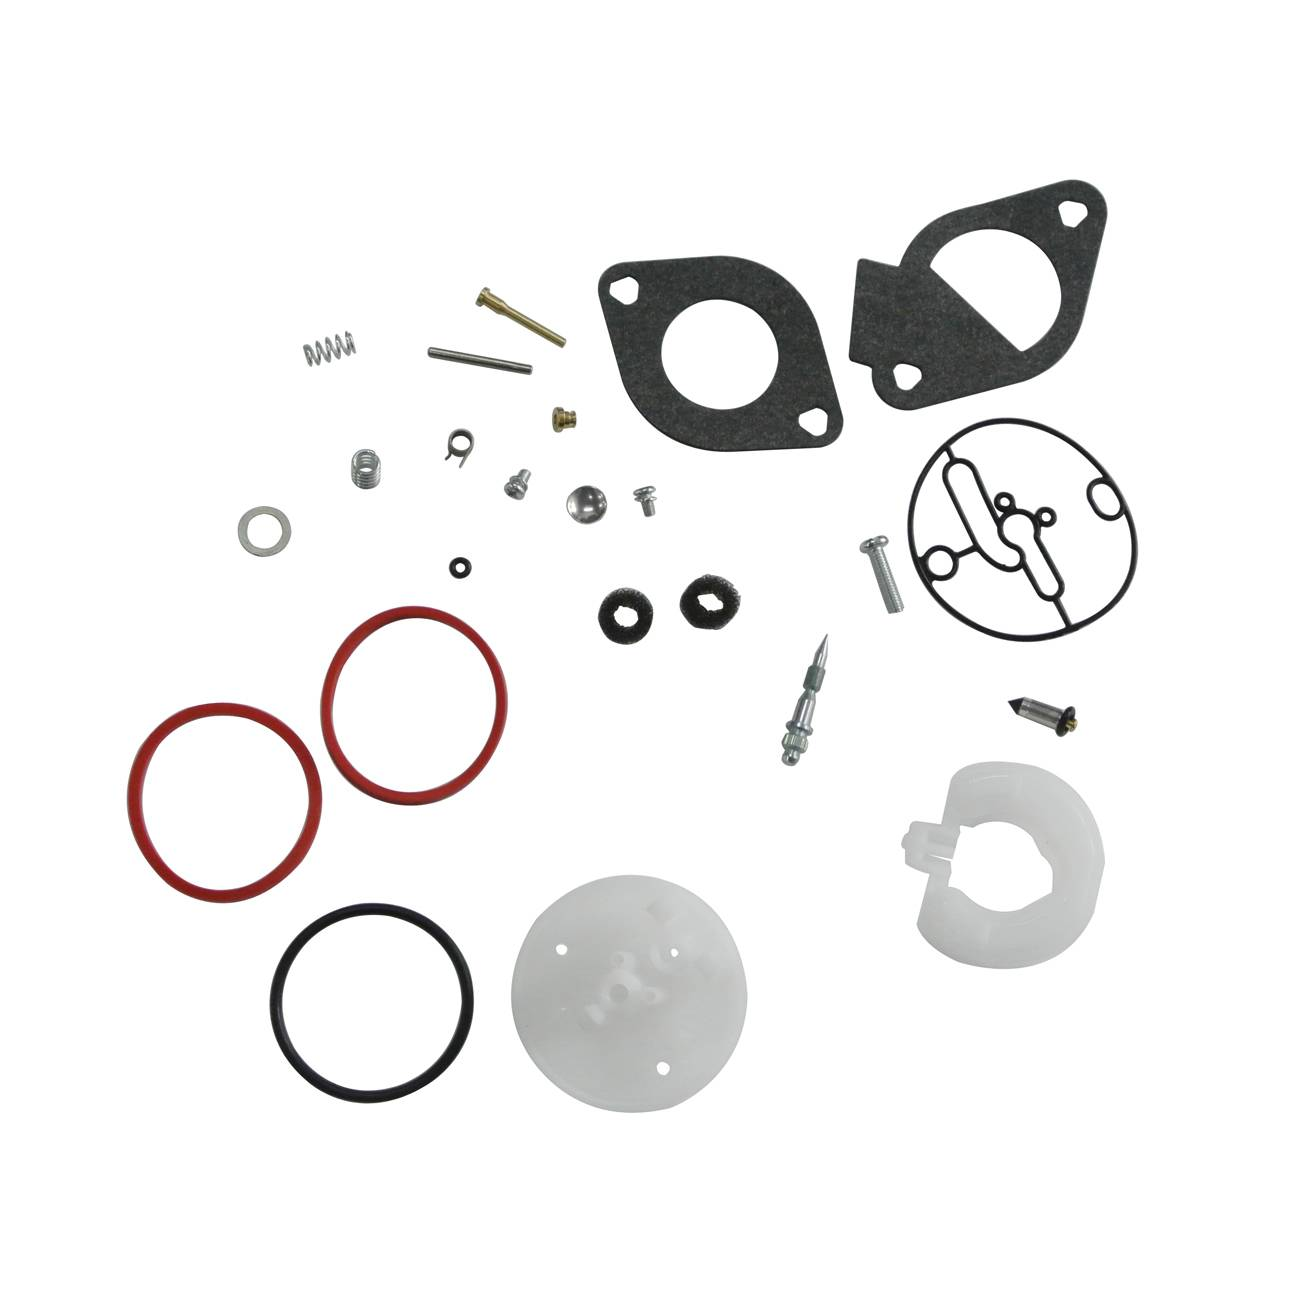 Carburetor Rebuild Kit Fit Briggs & Stratton Master Overhaul Nikki Carbs 796184